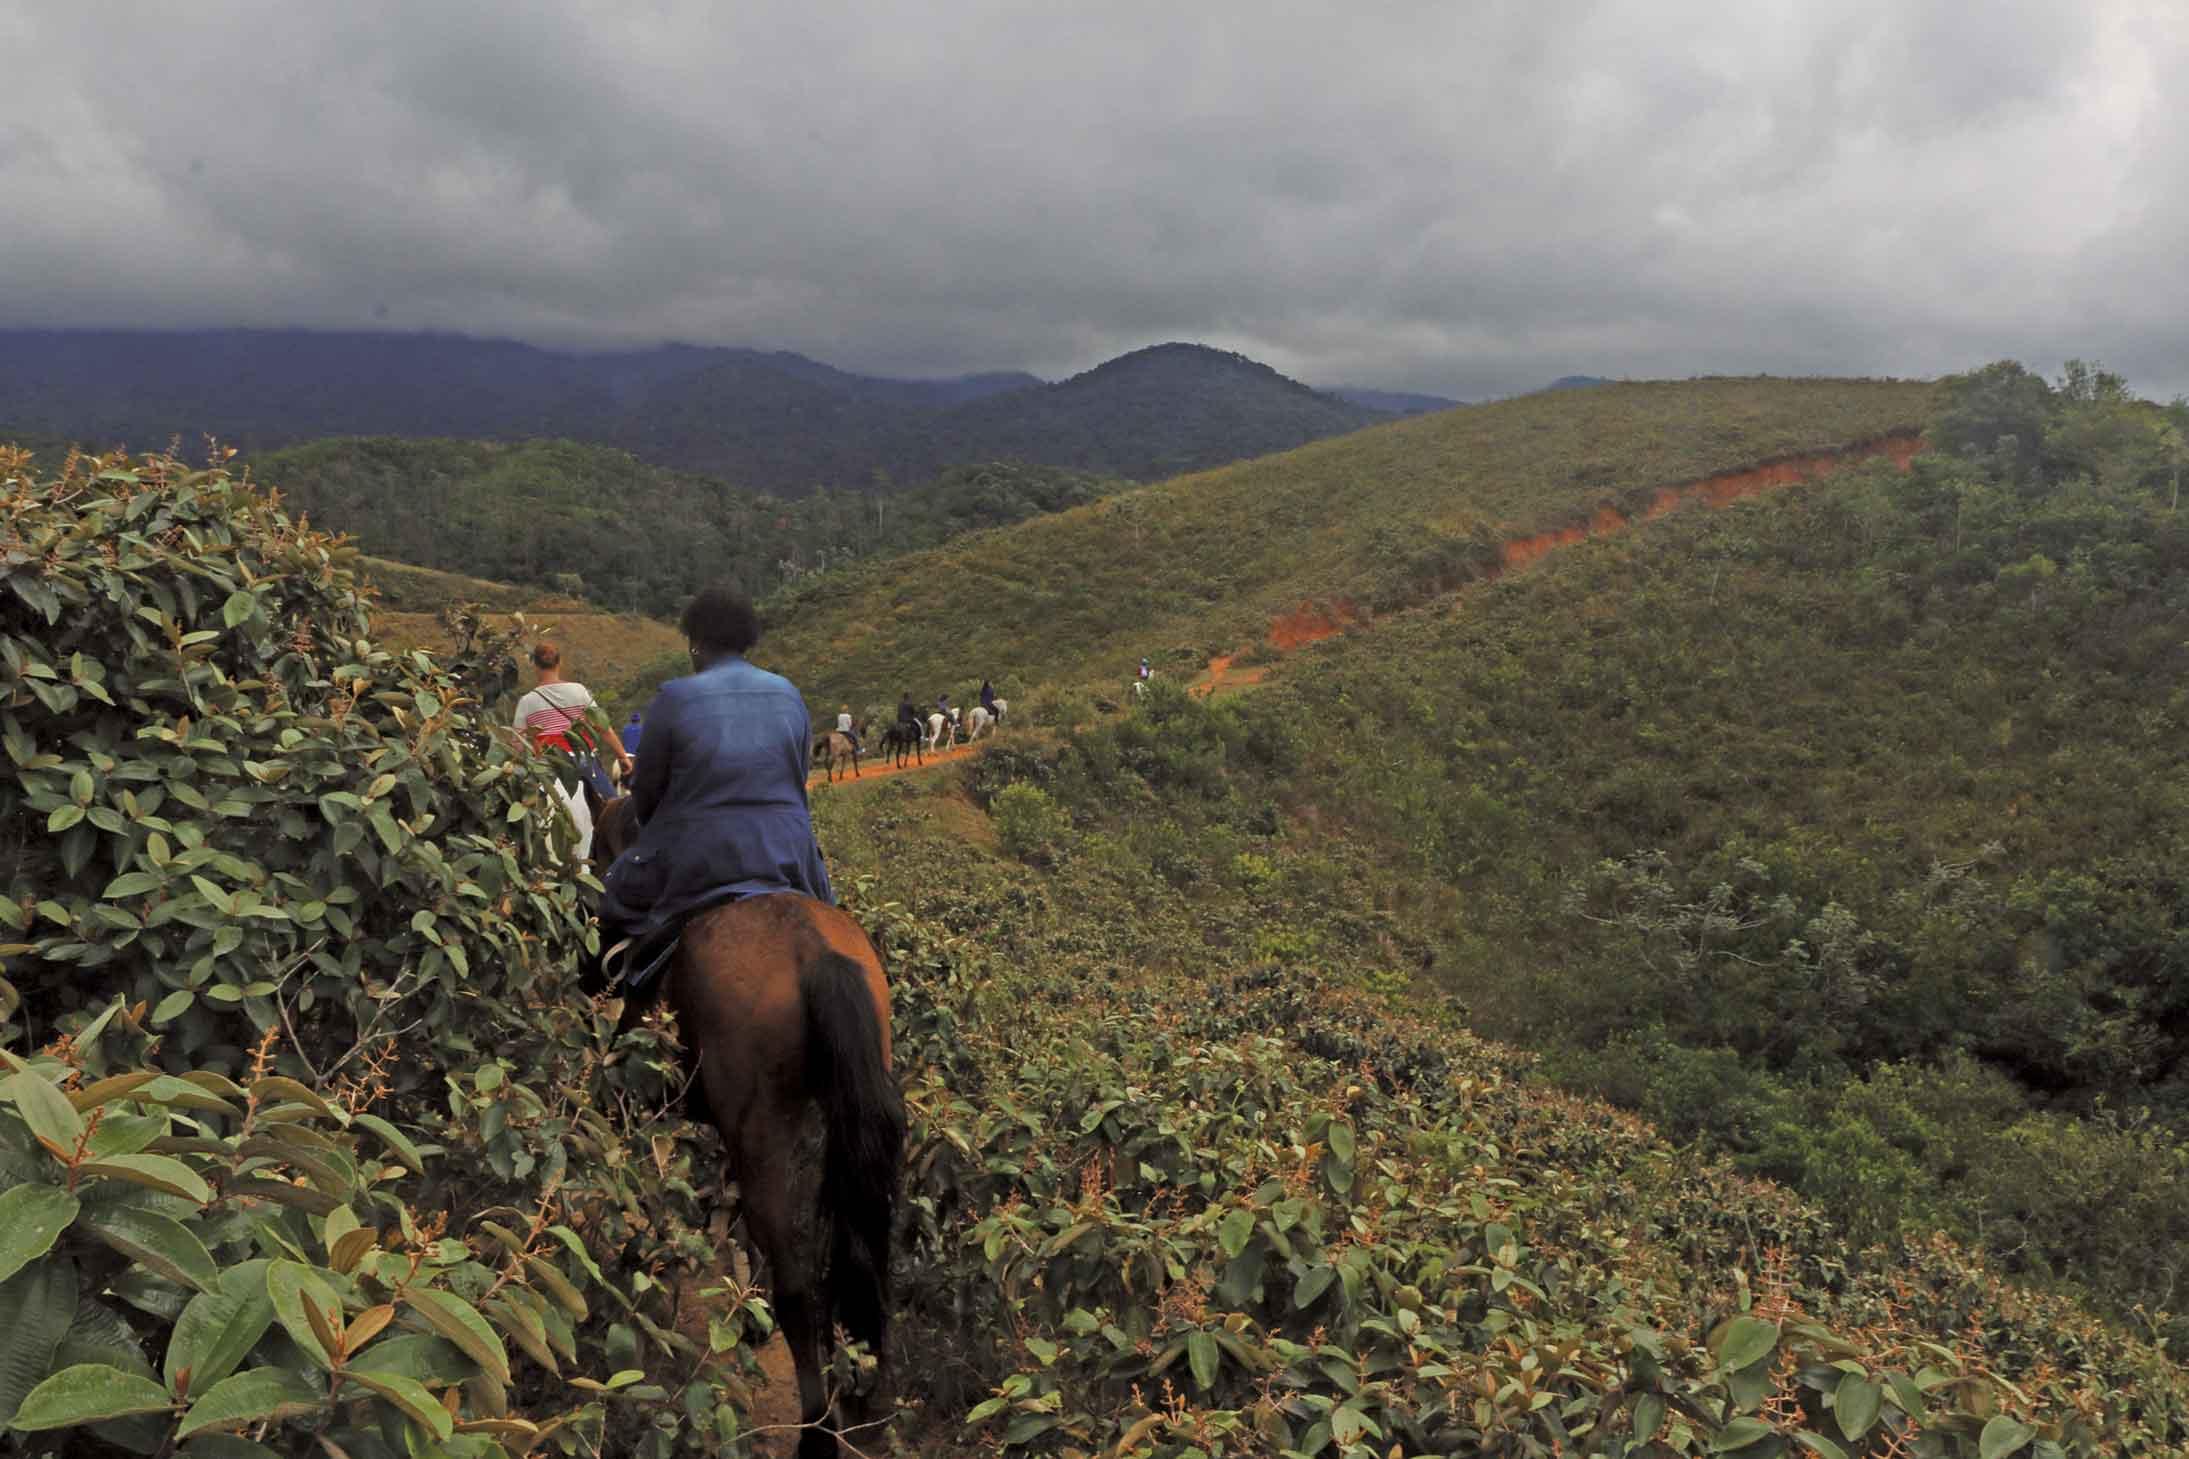 Penedo-Turismo-Rural-Rancho-Cavalgada-bx